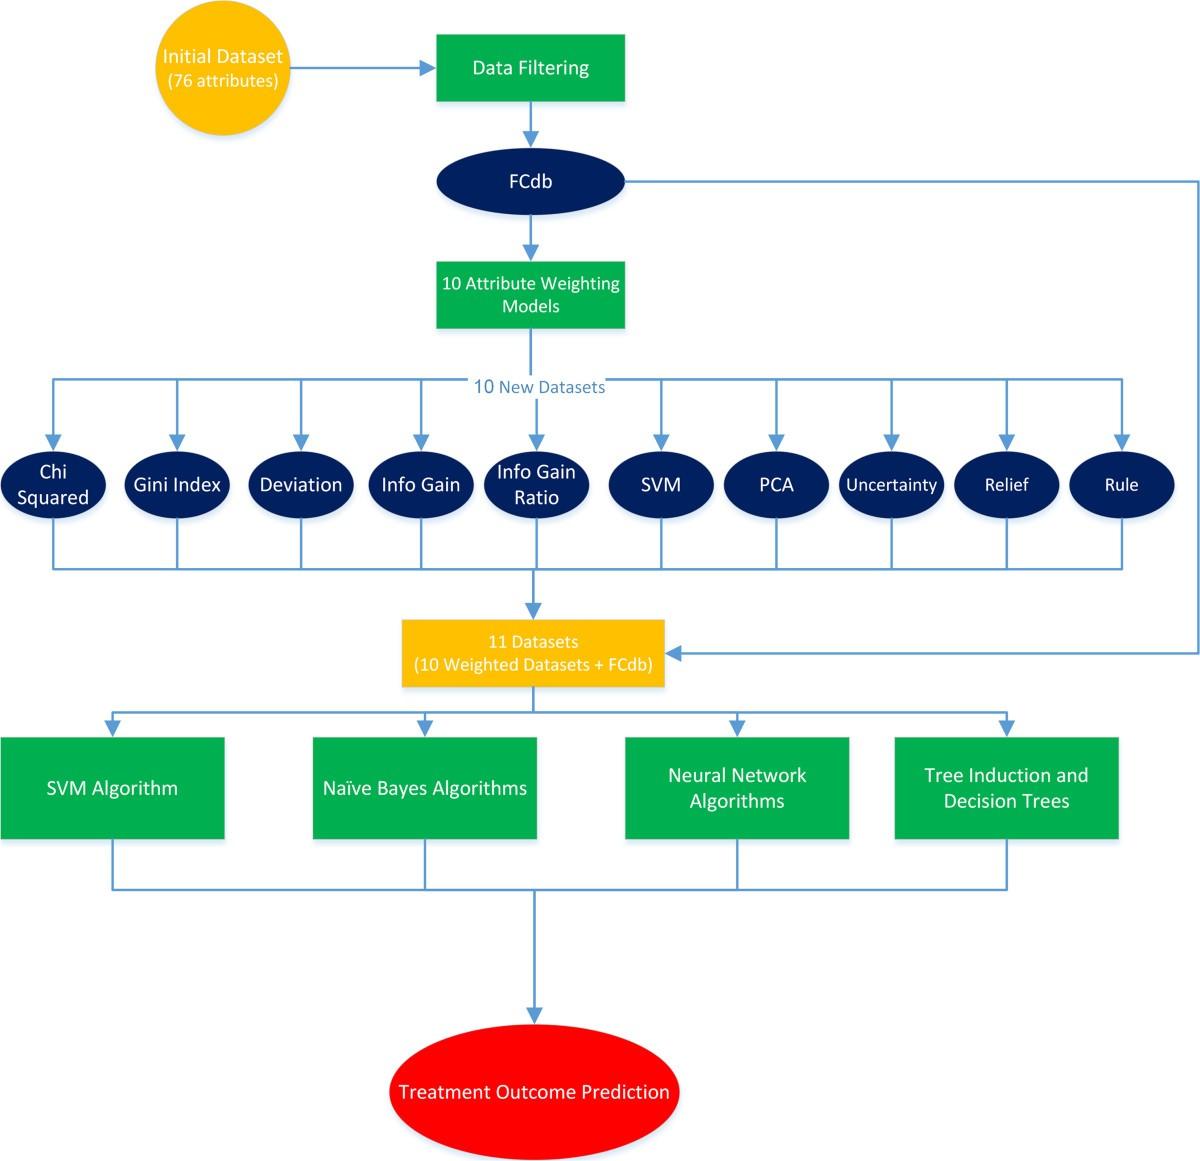 Prediction Of Hepatitis C Virus Interferon Ribavirin Therapy Outcome Filter Circuits 8211 Active Filters Figure 1